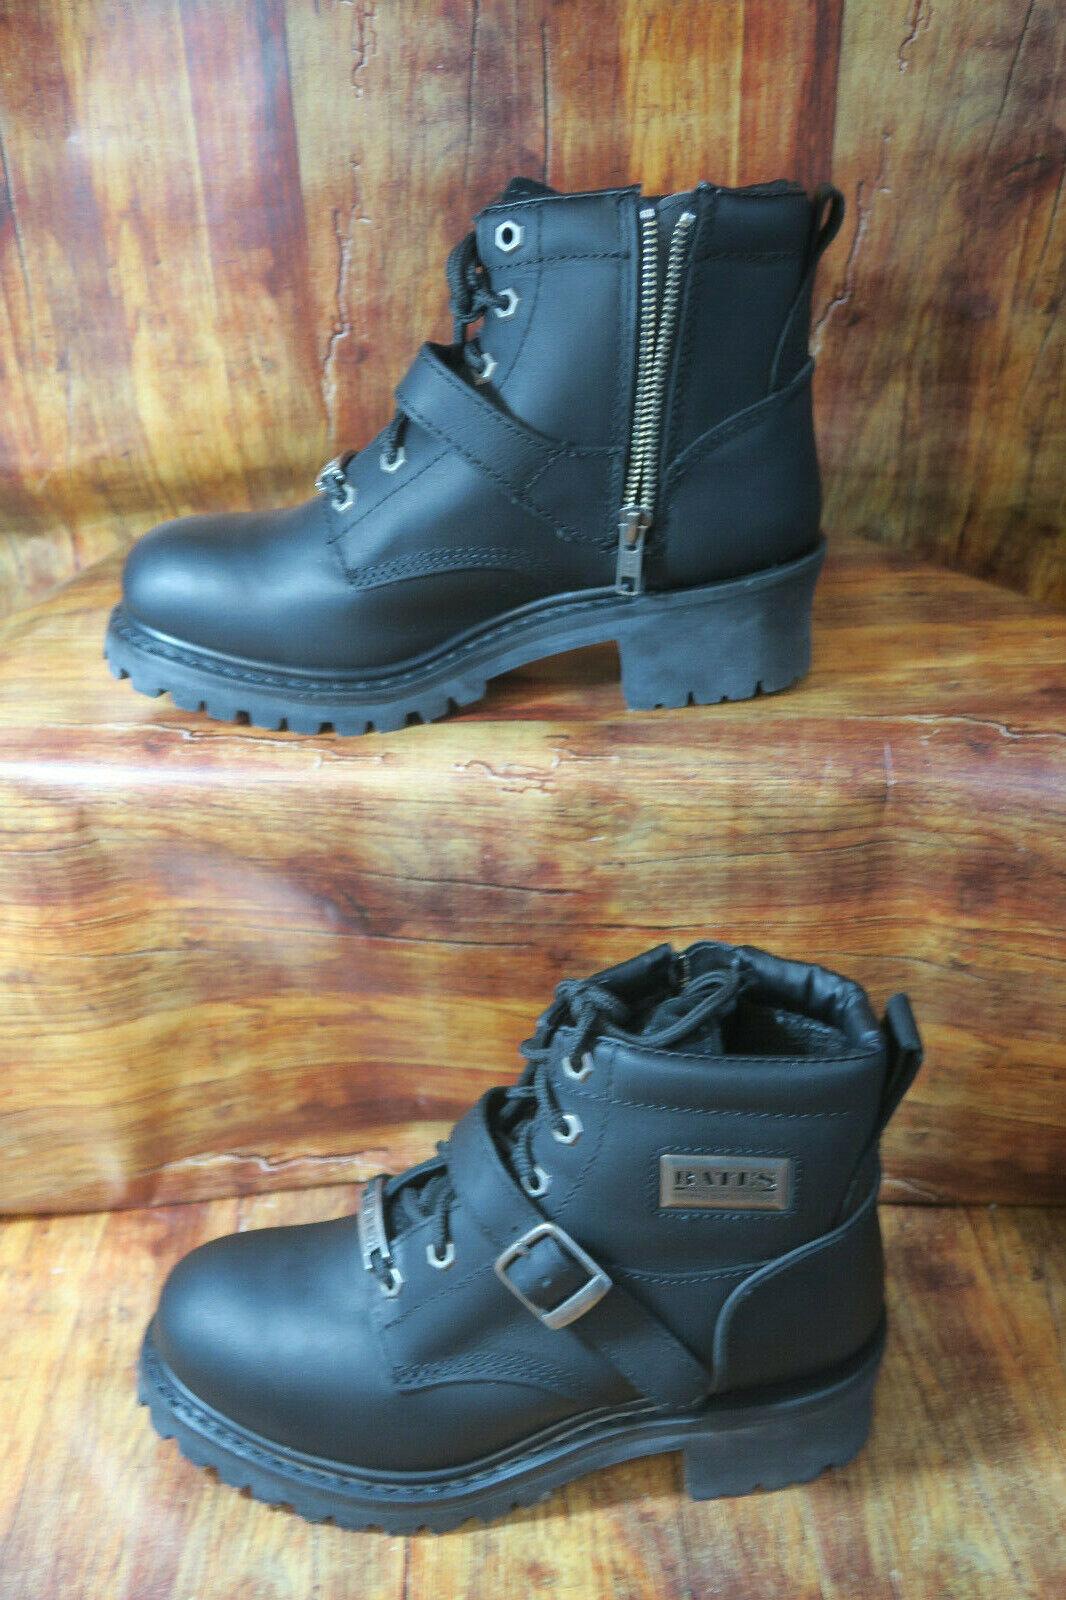 Bates Women's Albion Logger Boot,Black,7 M US